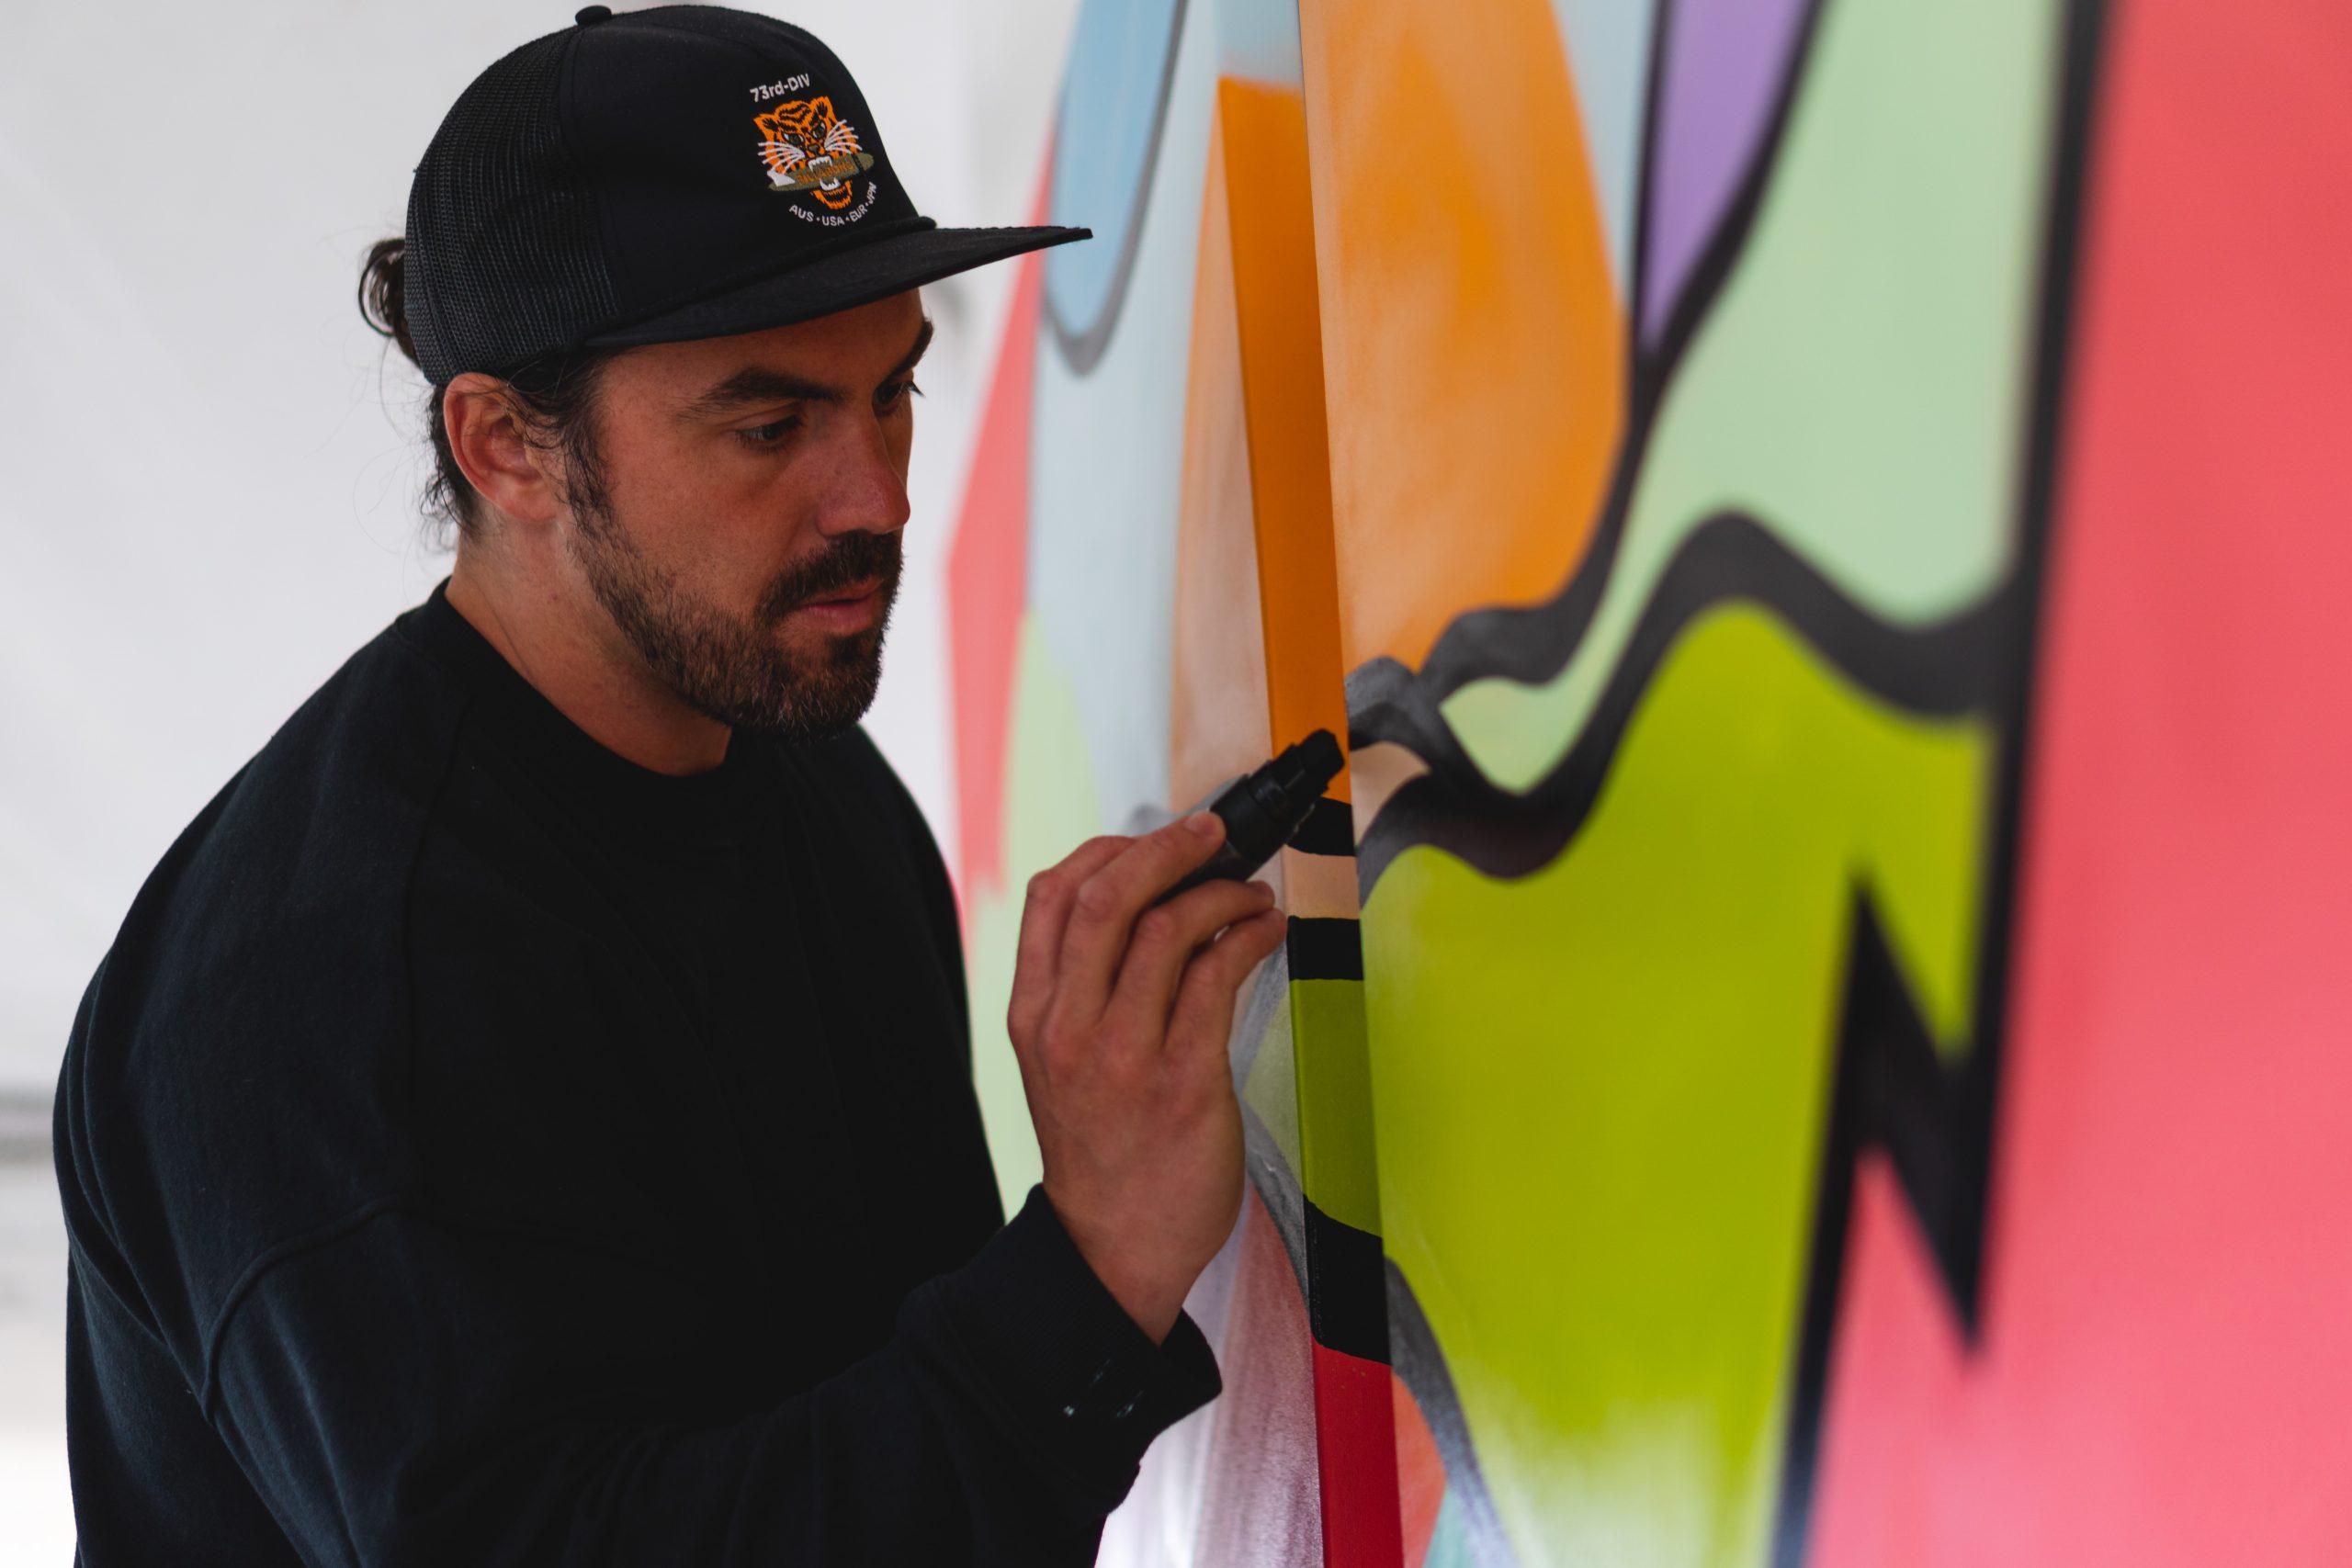 an artist paints black lines on a colorful canvas